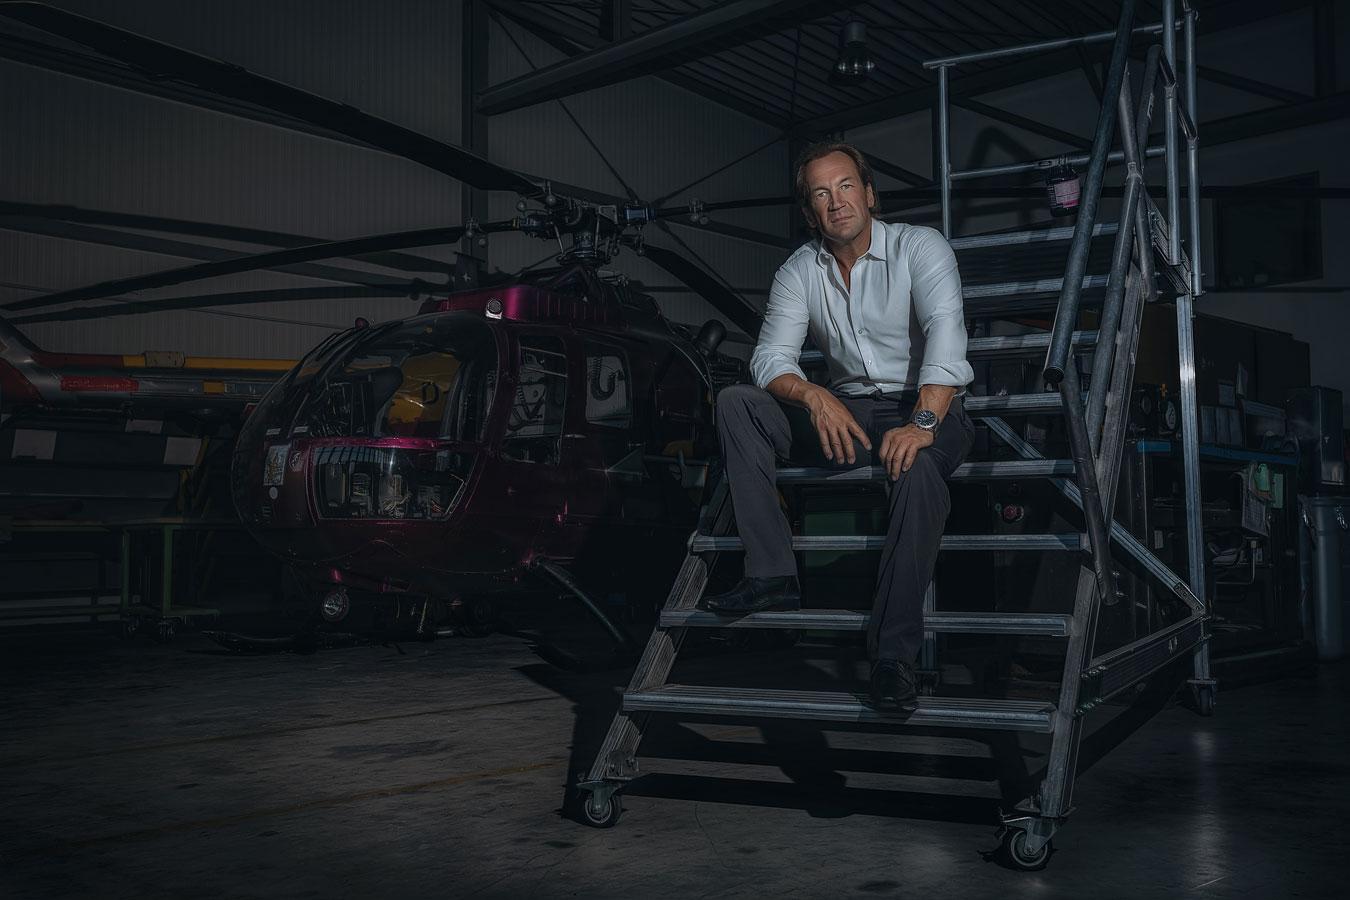 MS Helicopter / Business/ Portrait / Event / Fotostyle Schindler / Straubing www.fotostyle-schindler.de